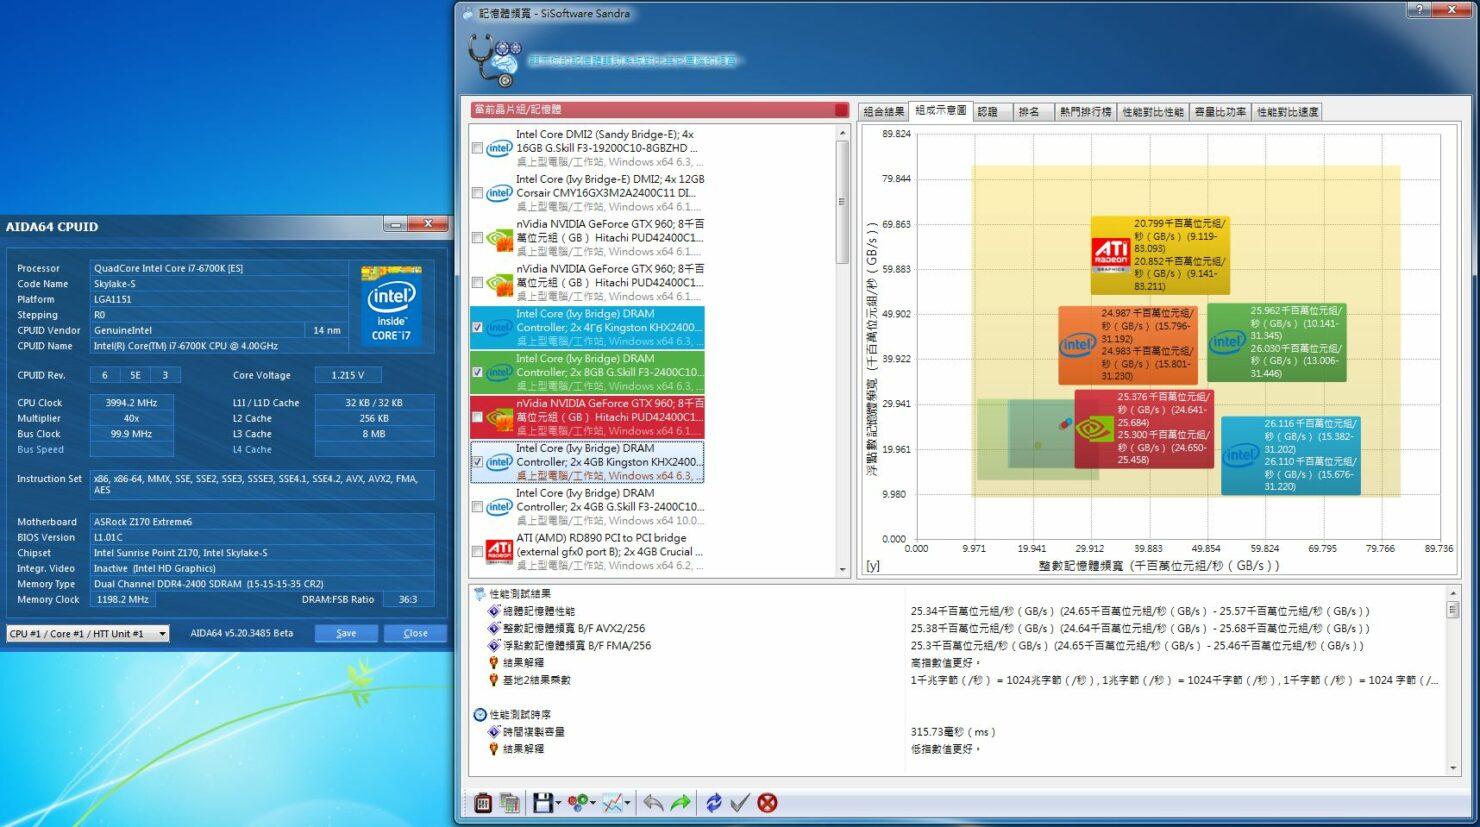 intel-core-i7-6700k_stock_sandra-ram